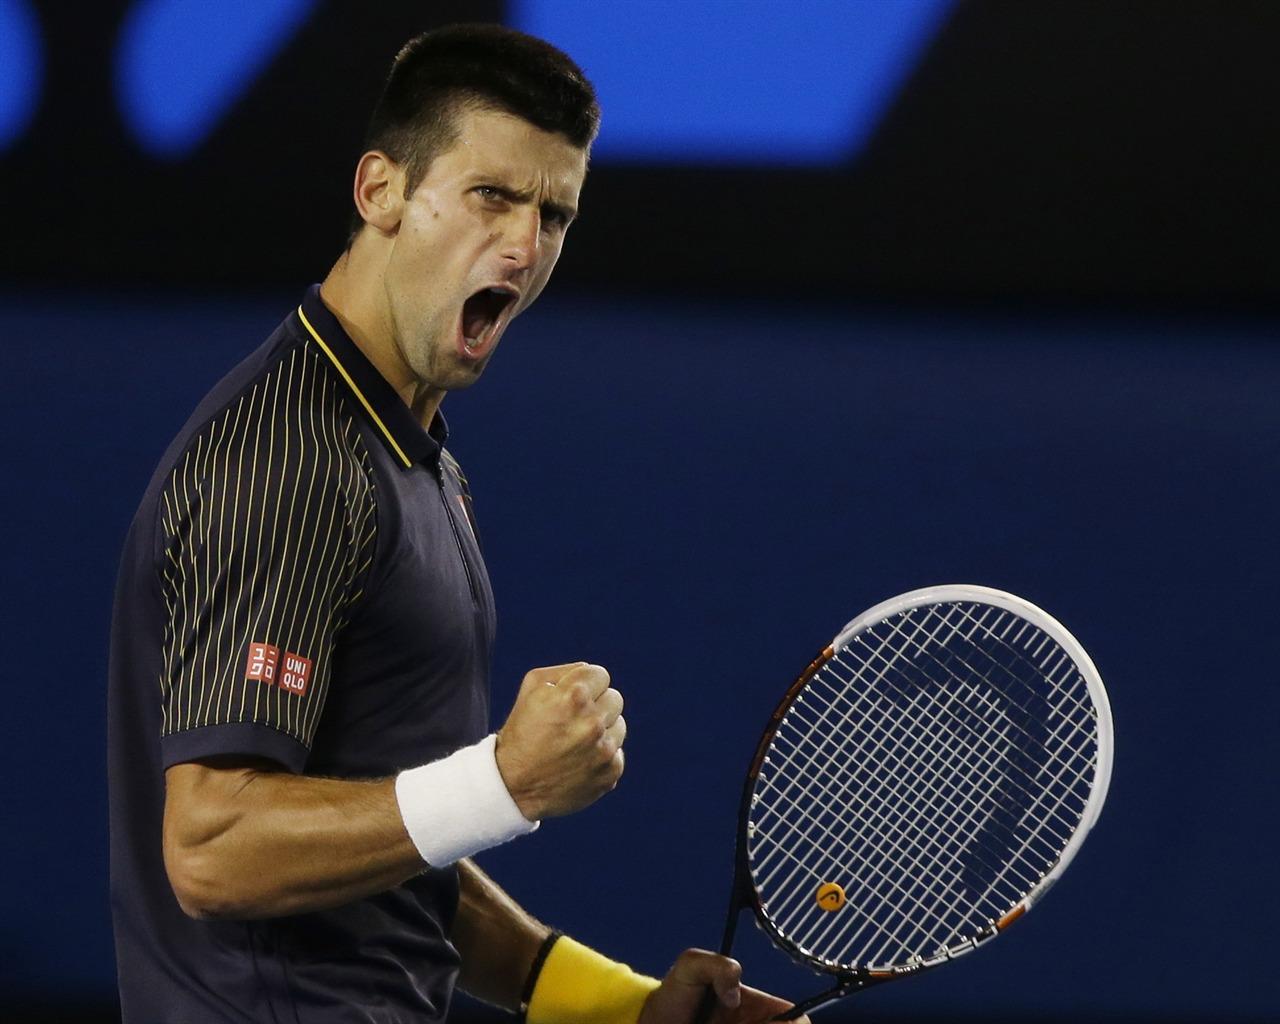 2013 Australian Open – Men's Singles